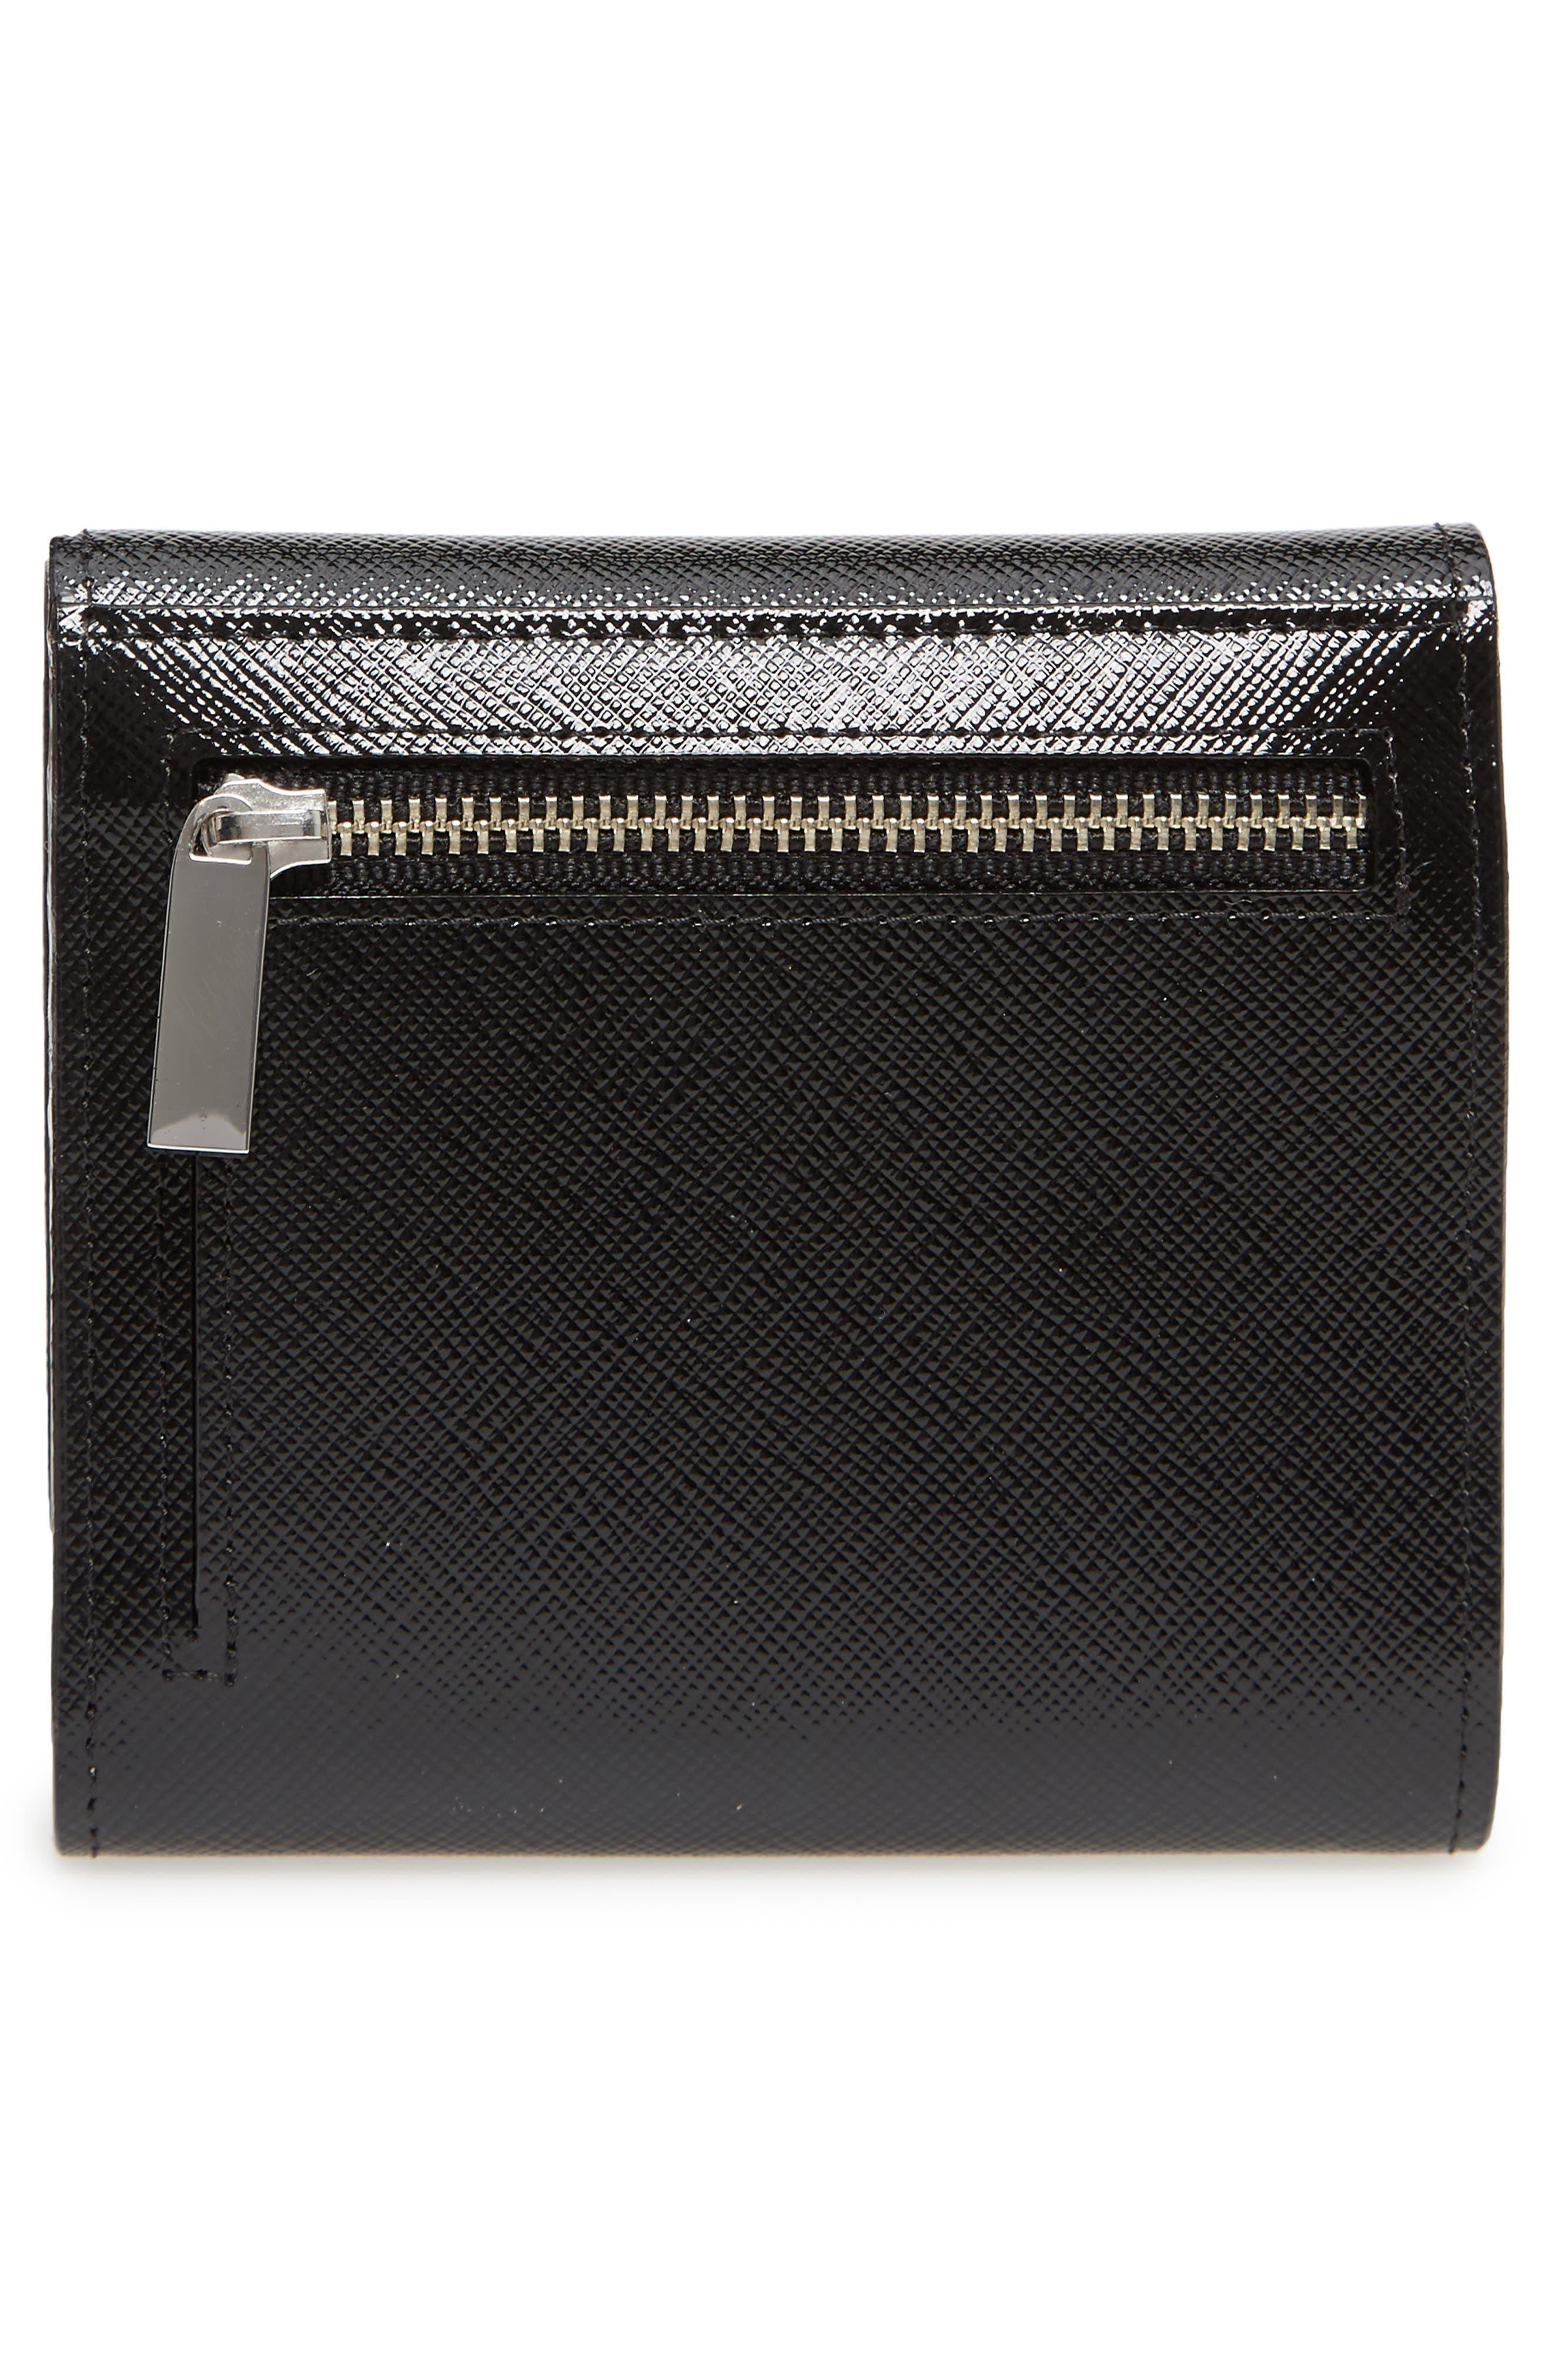 Trifold Leather Envelope Wallet,                             Alternate thumbnail 4, color,                             Black